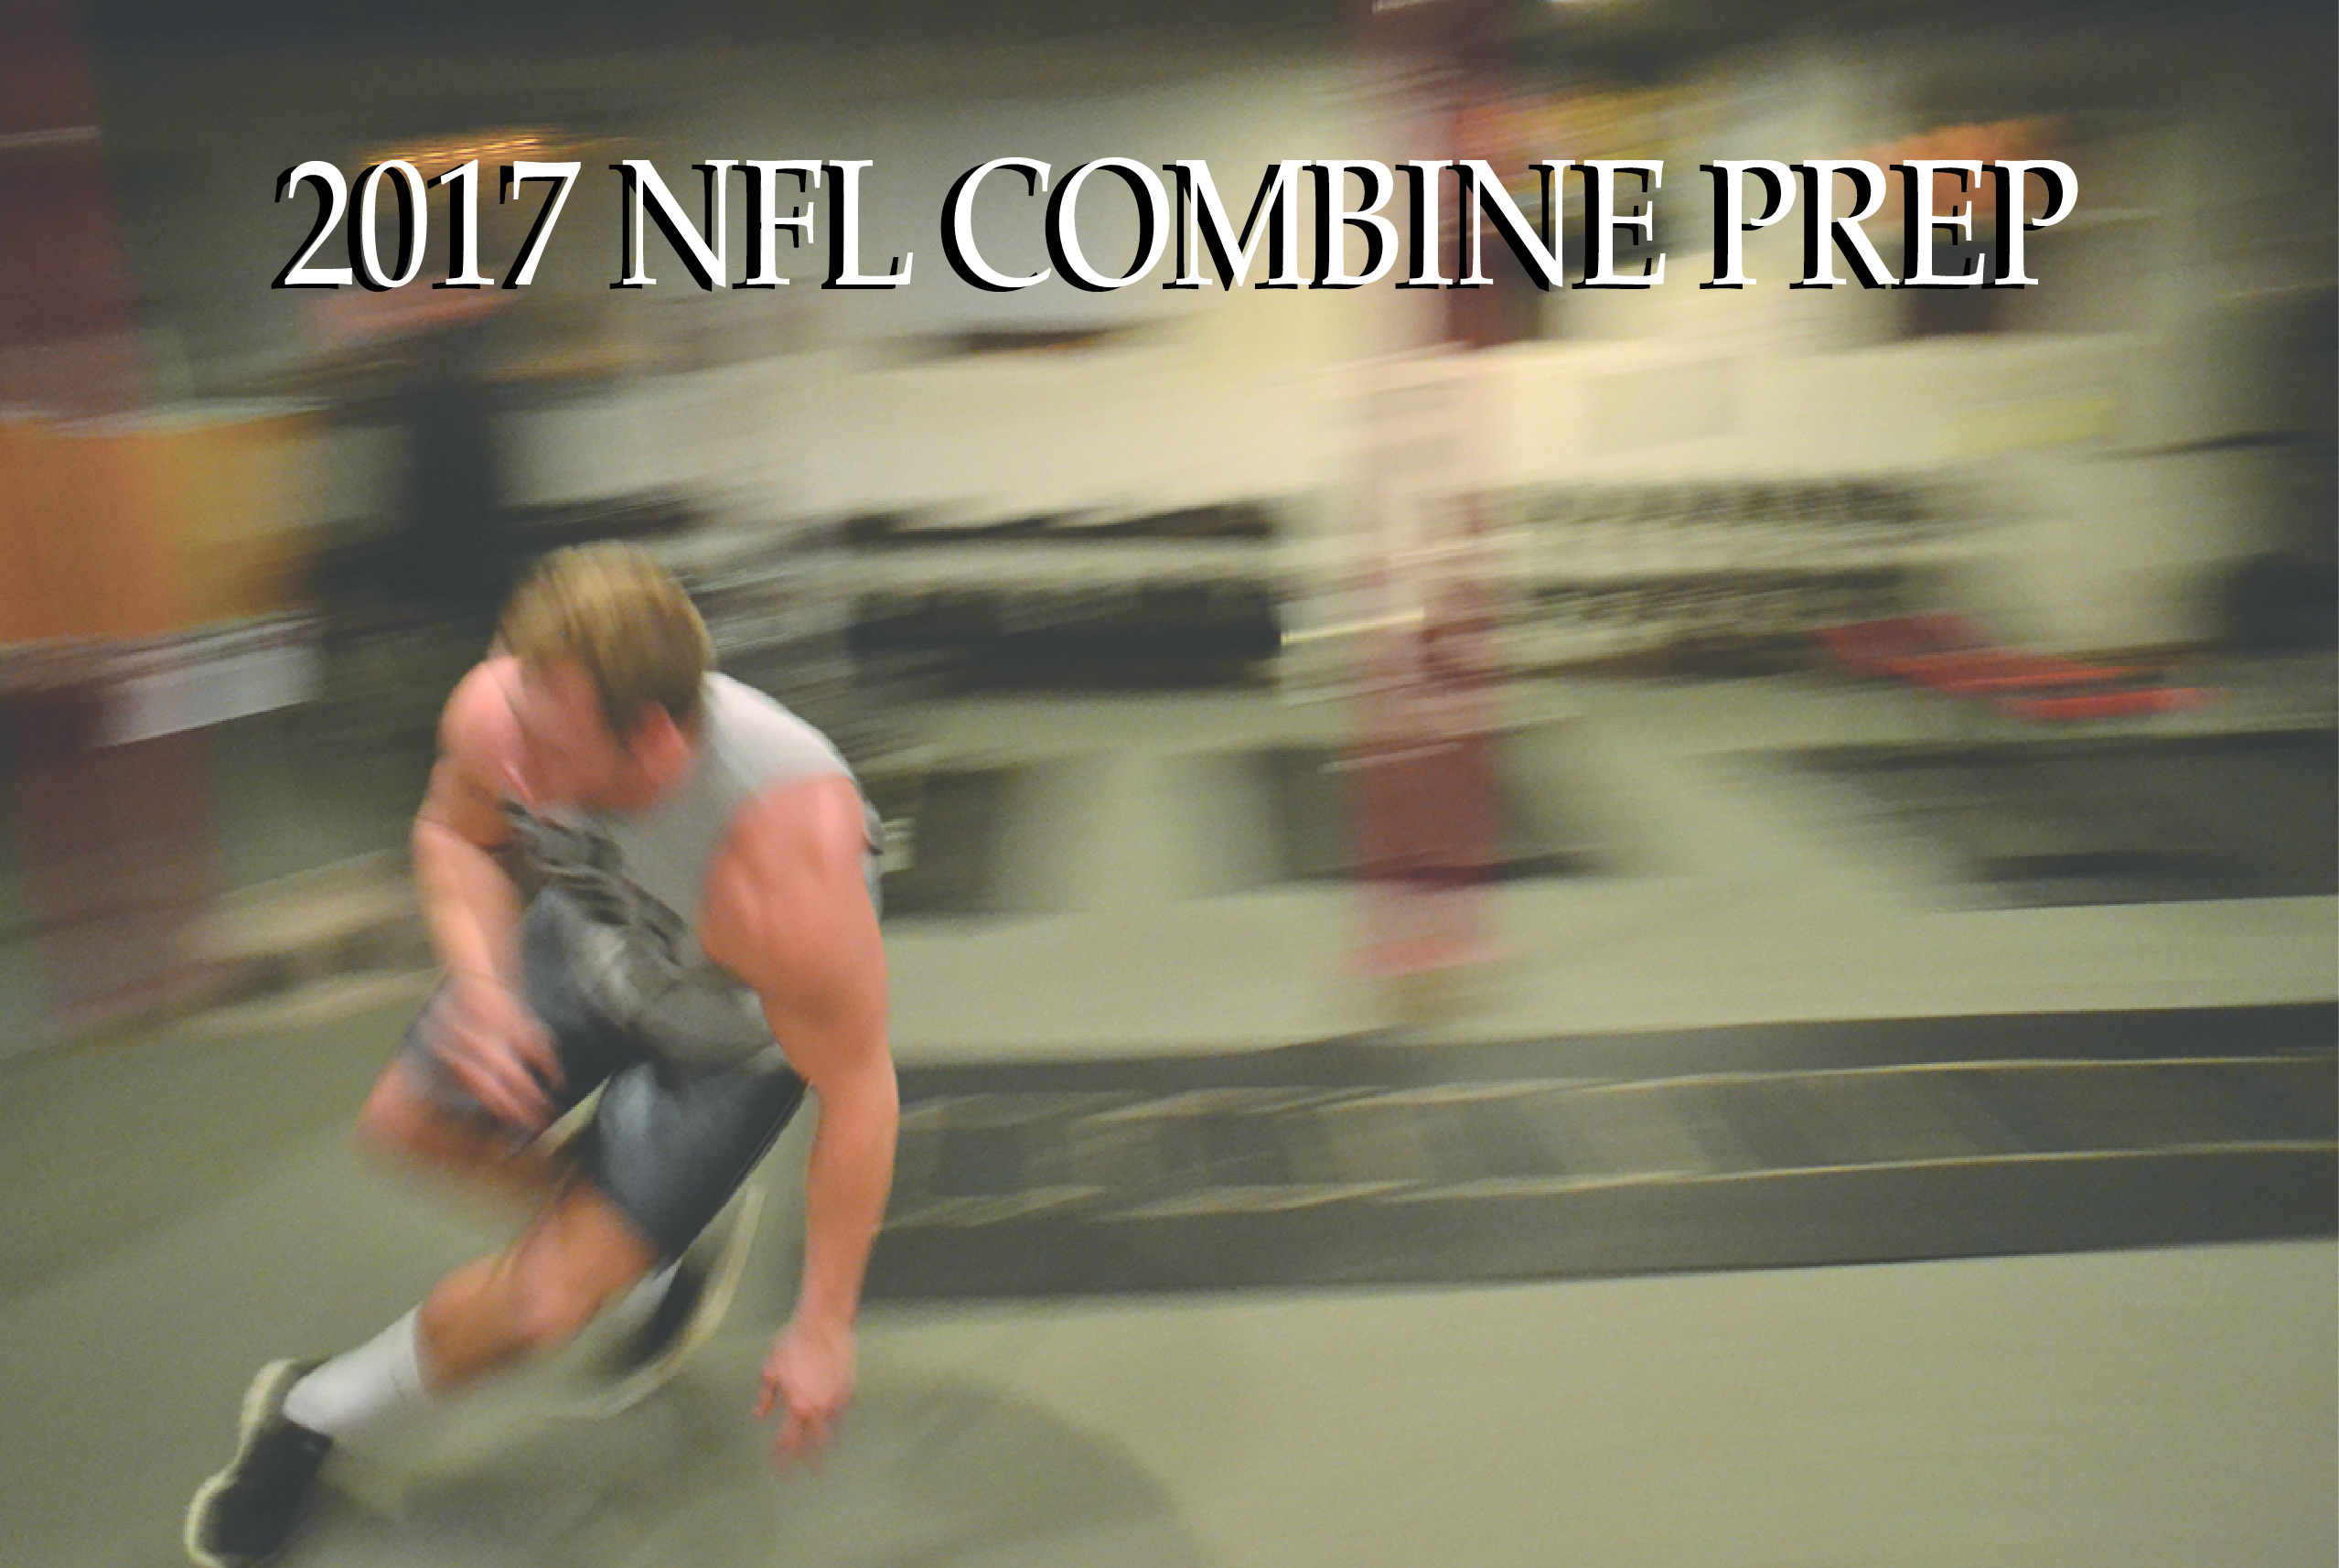 NFL Combine Prep